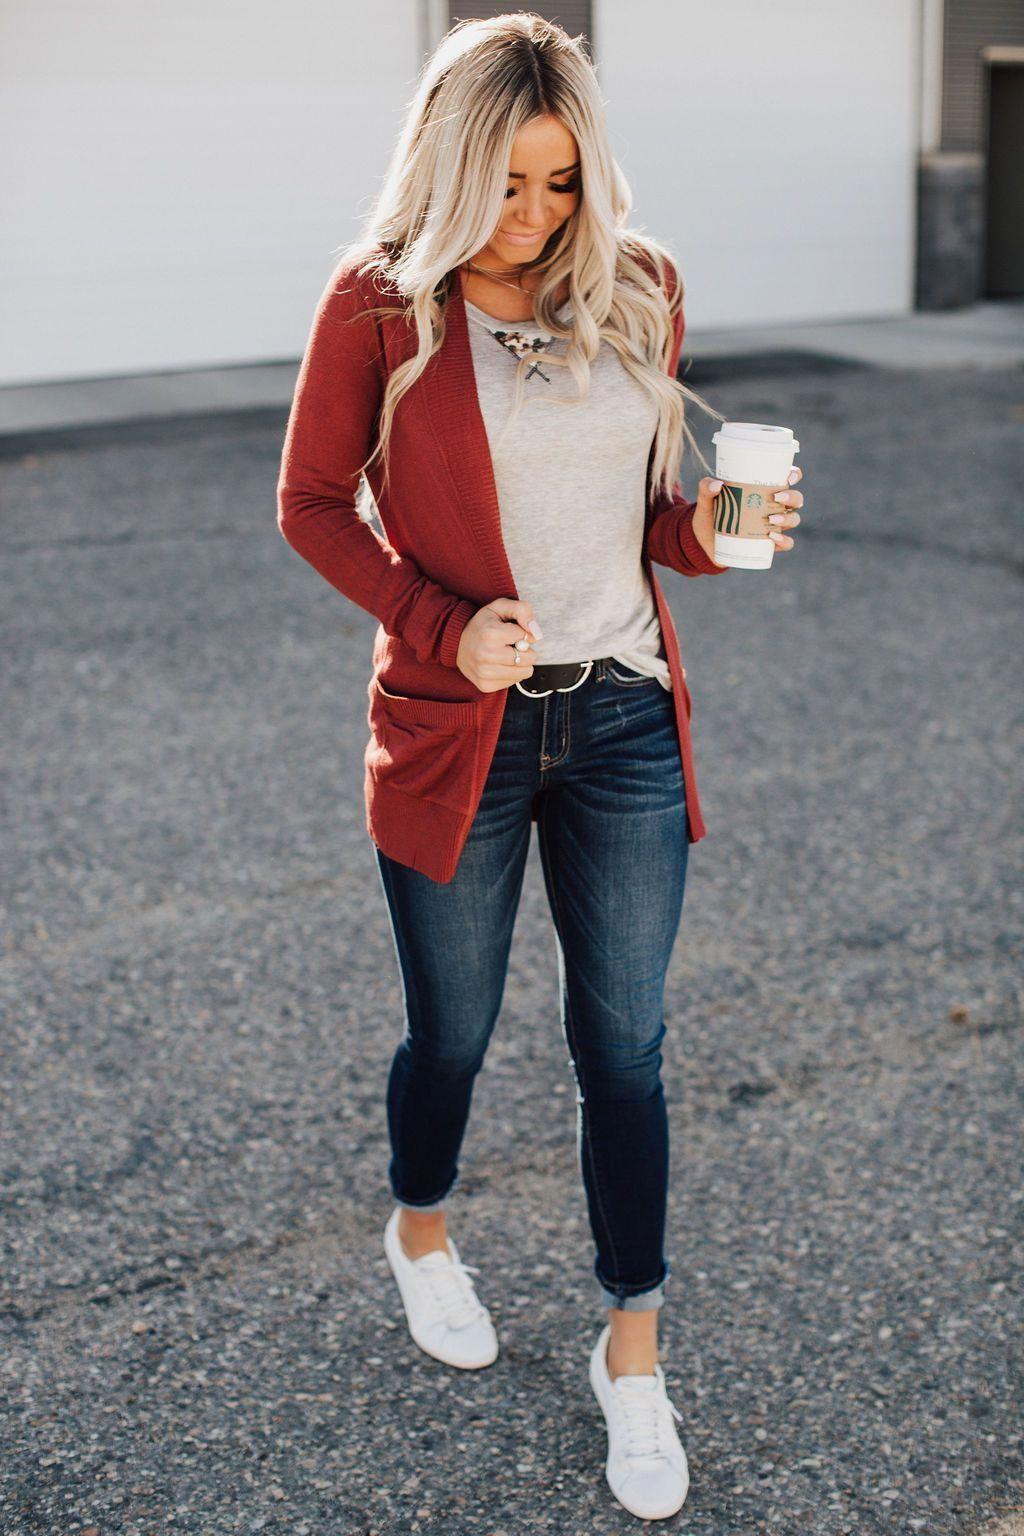 Lightweight Cuddle Cardigan Rust Red in 2020 | Cute casual